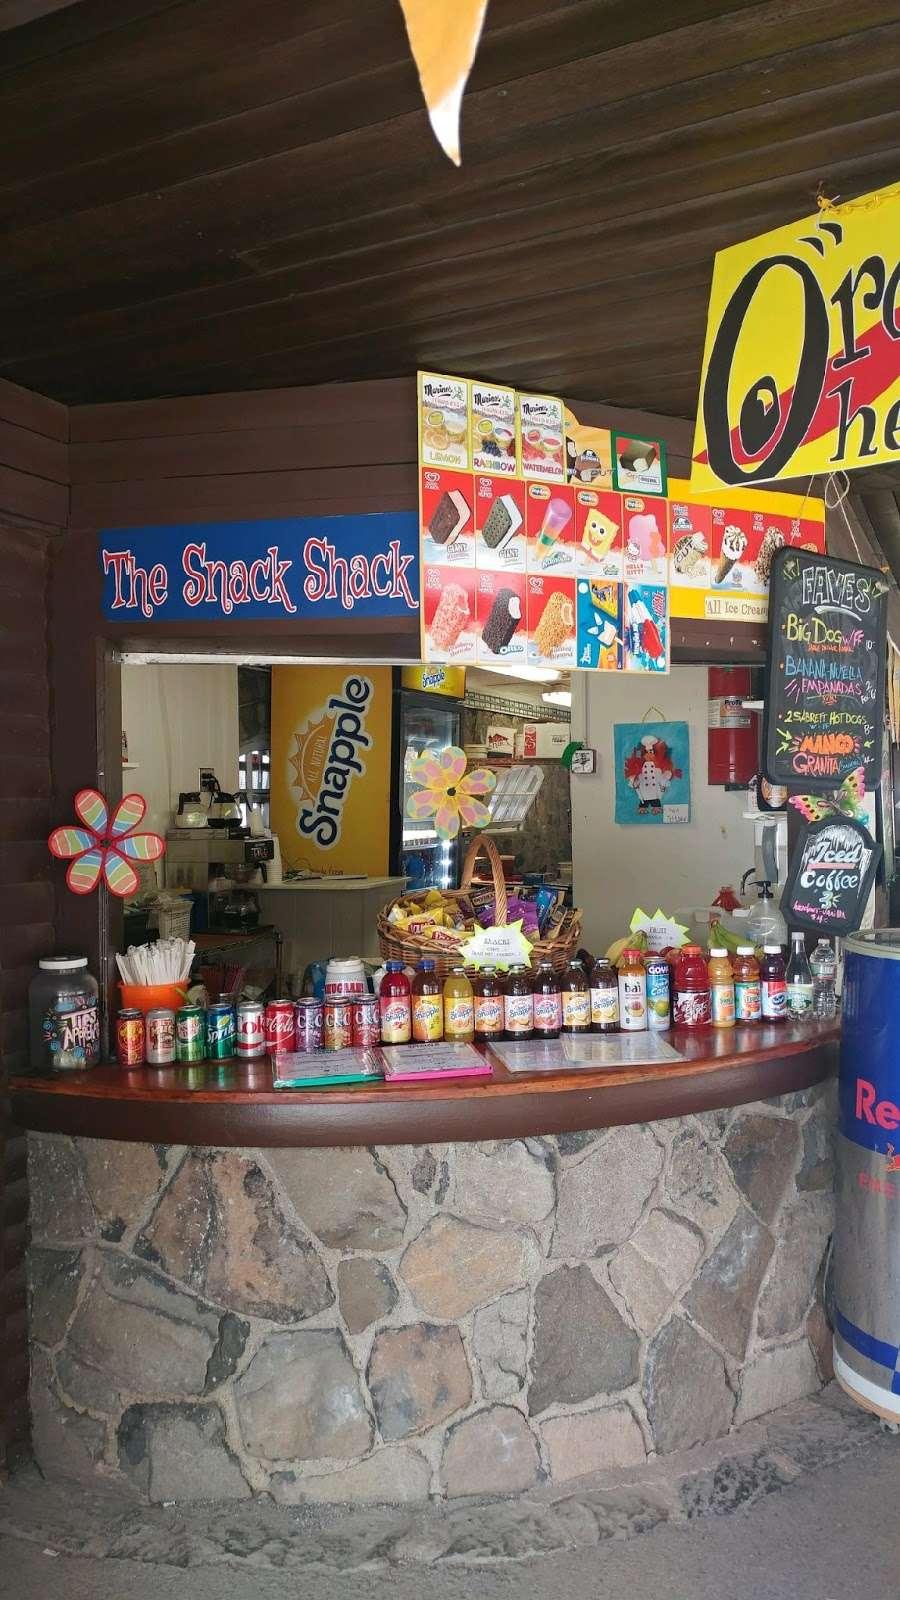 The Snack Shack NJ - restaurant  | Photo 3 of 10 | Address: Palisades Interstate Pkwy, Englewood Cliffs, NJ 07632, USA | Phone: (201) 741-4334